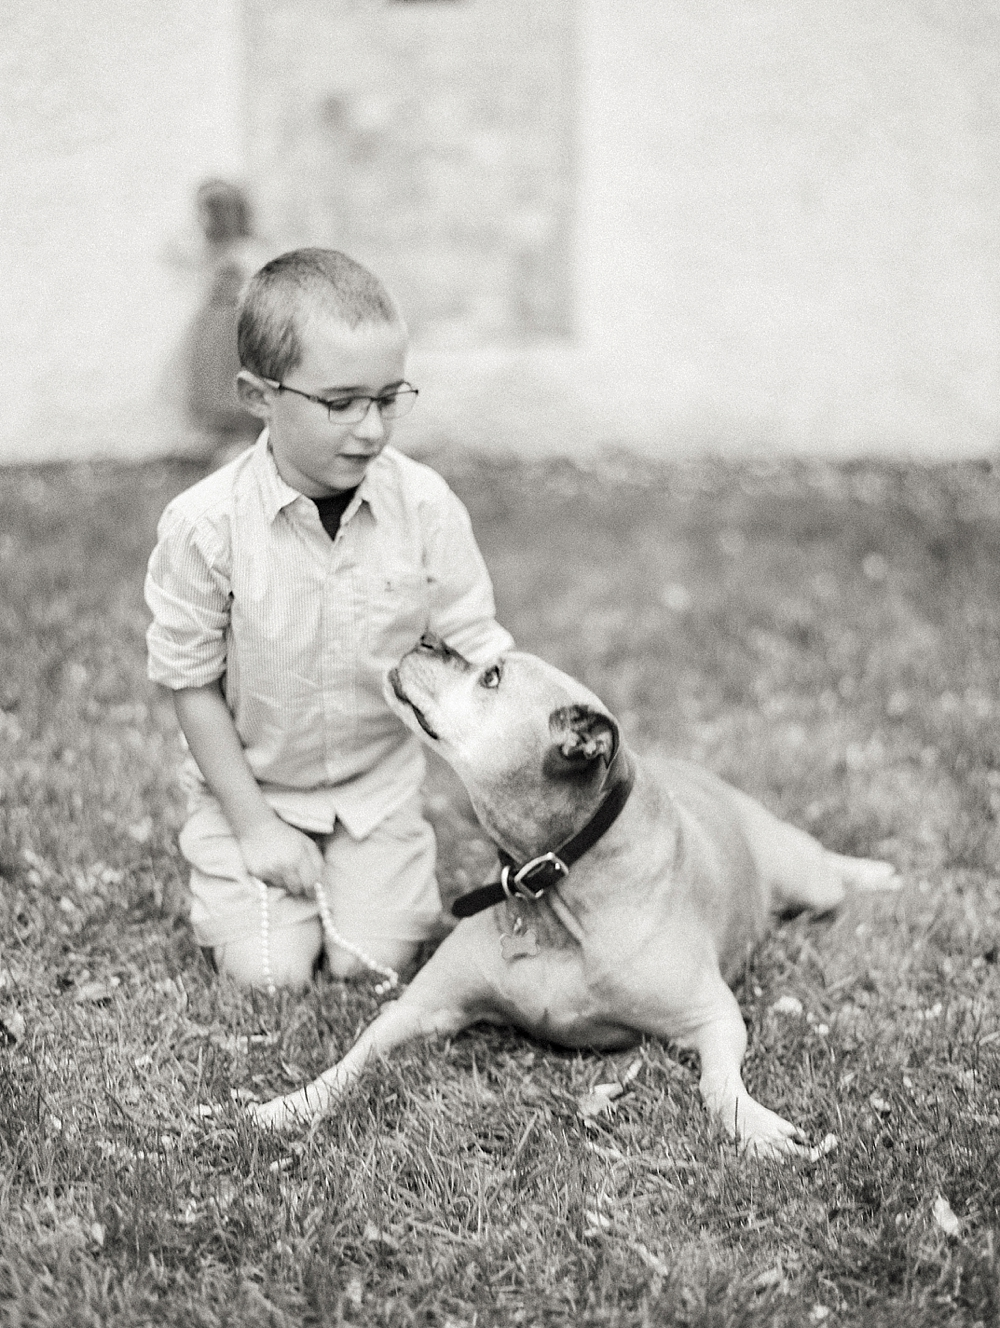 kristin-la-voie-photography-lifestyle-chicago-dog-76